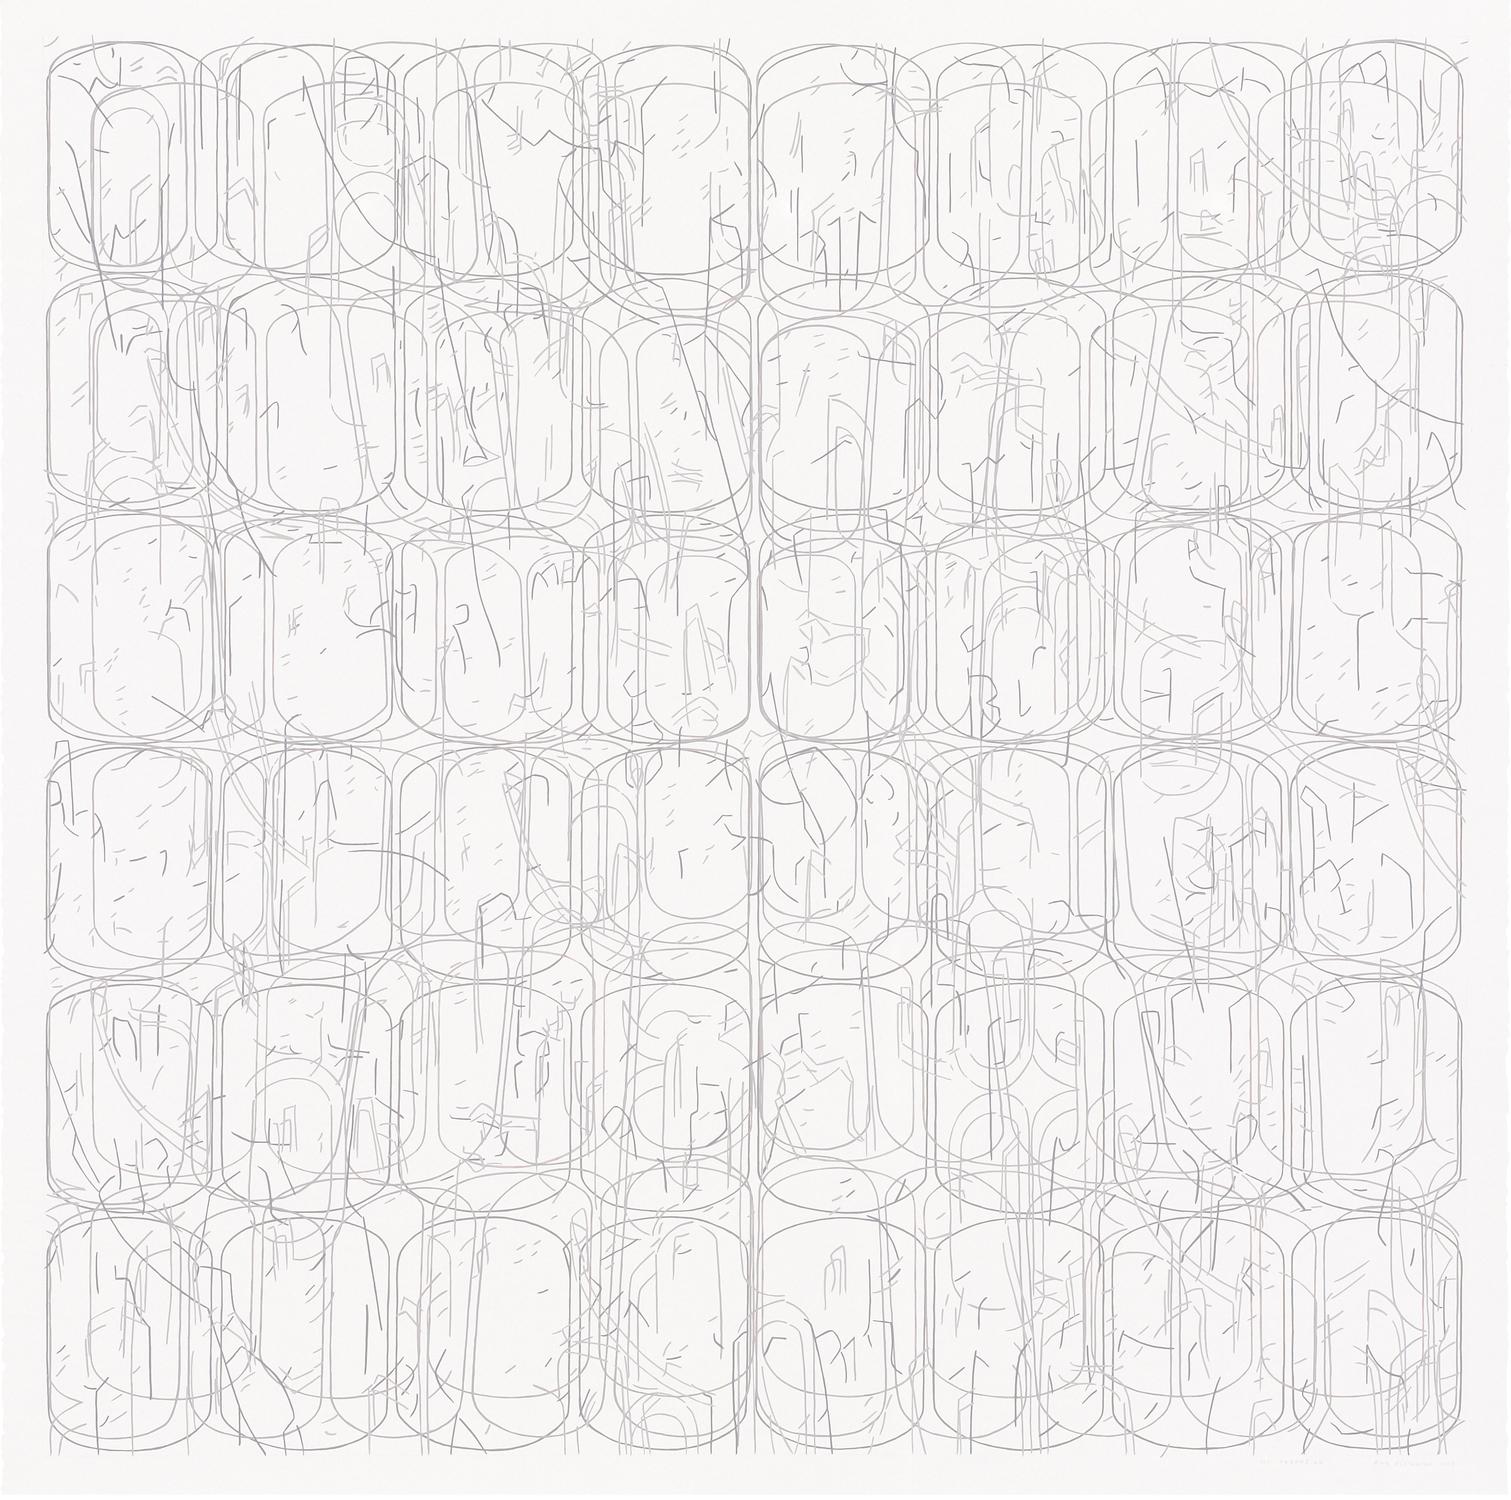 "No. 062008.02, 2008 Gouache on Rising Stonehenge paper 38"" x 38"" (41"" x 41"" framed)"